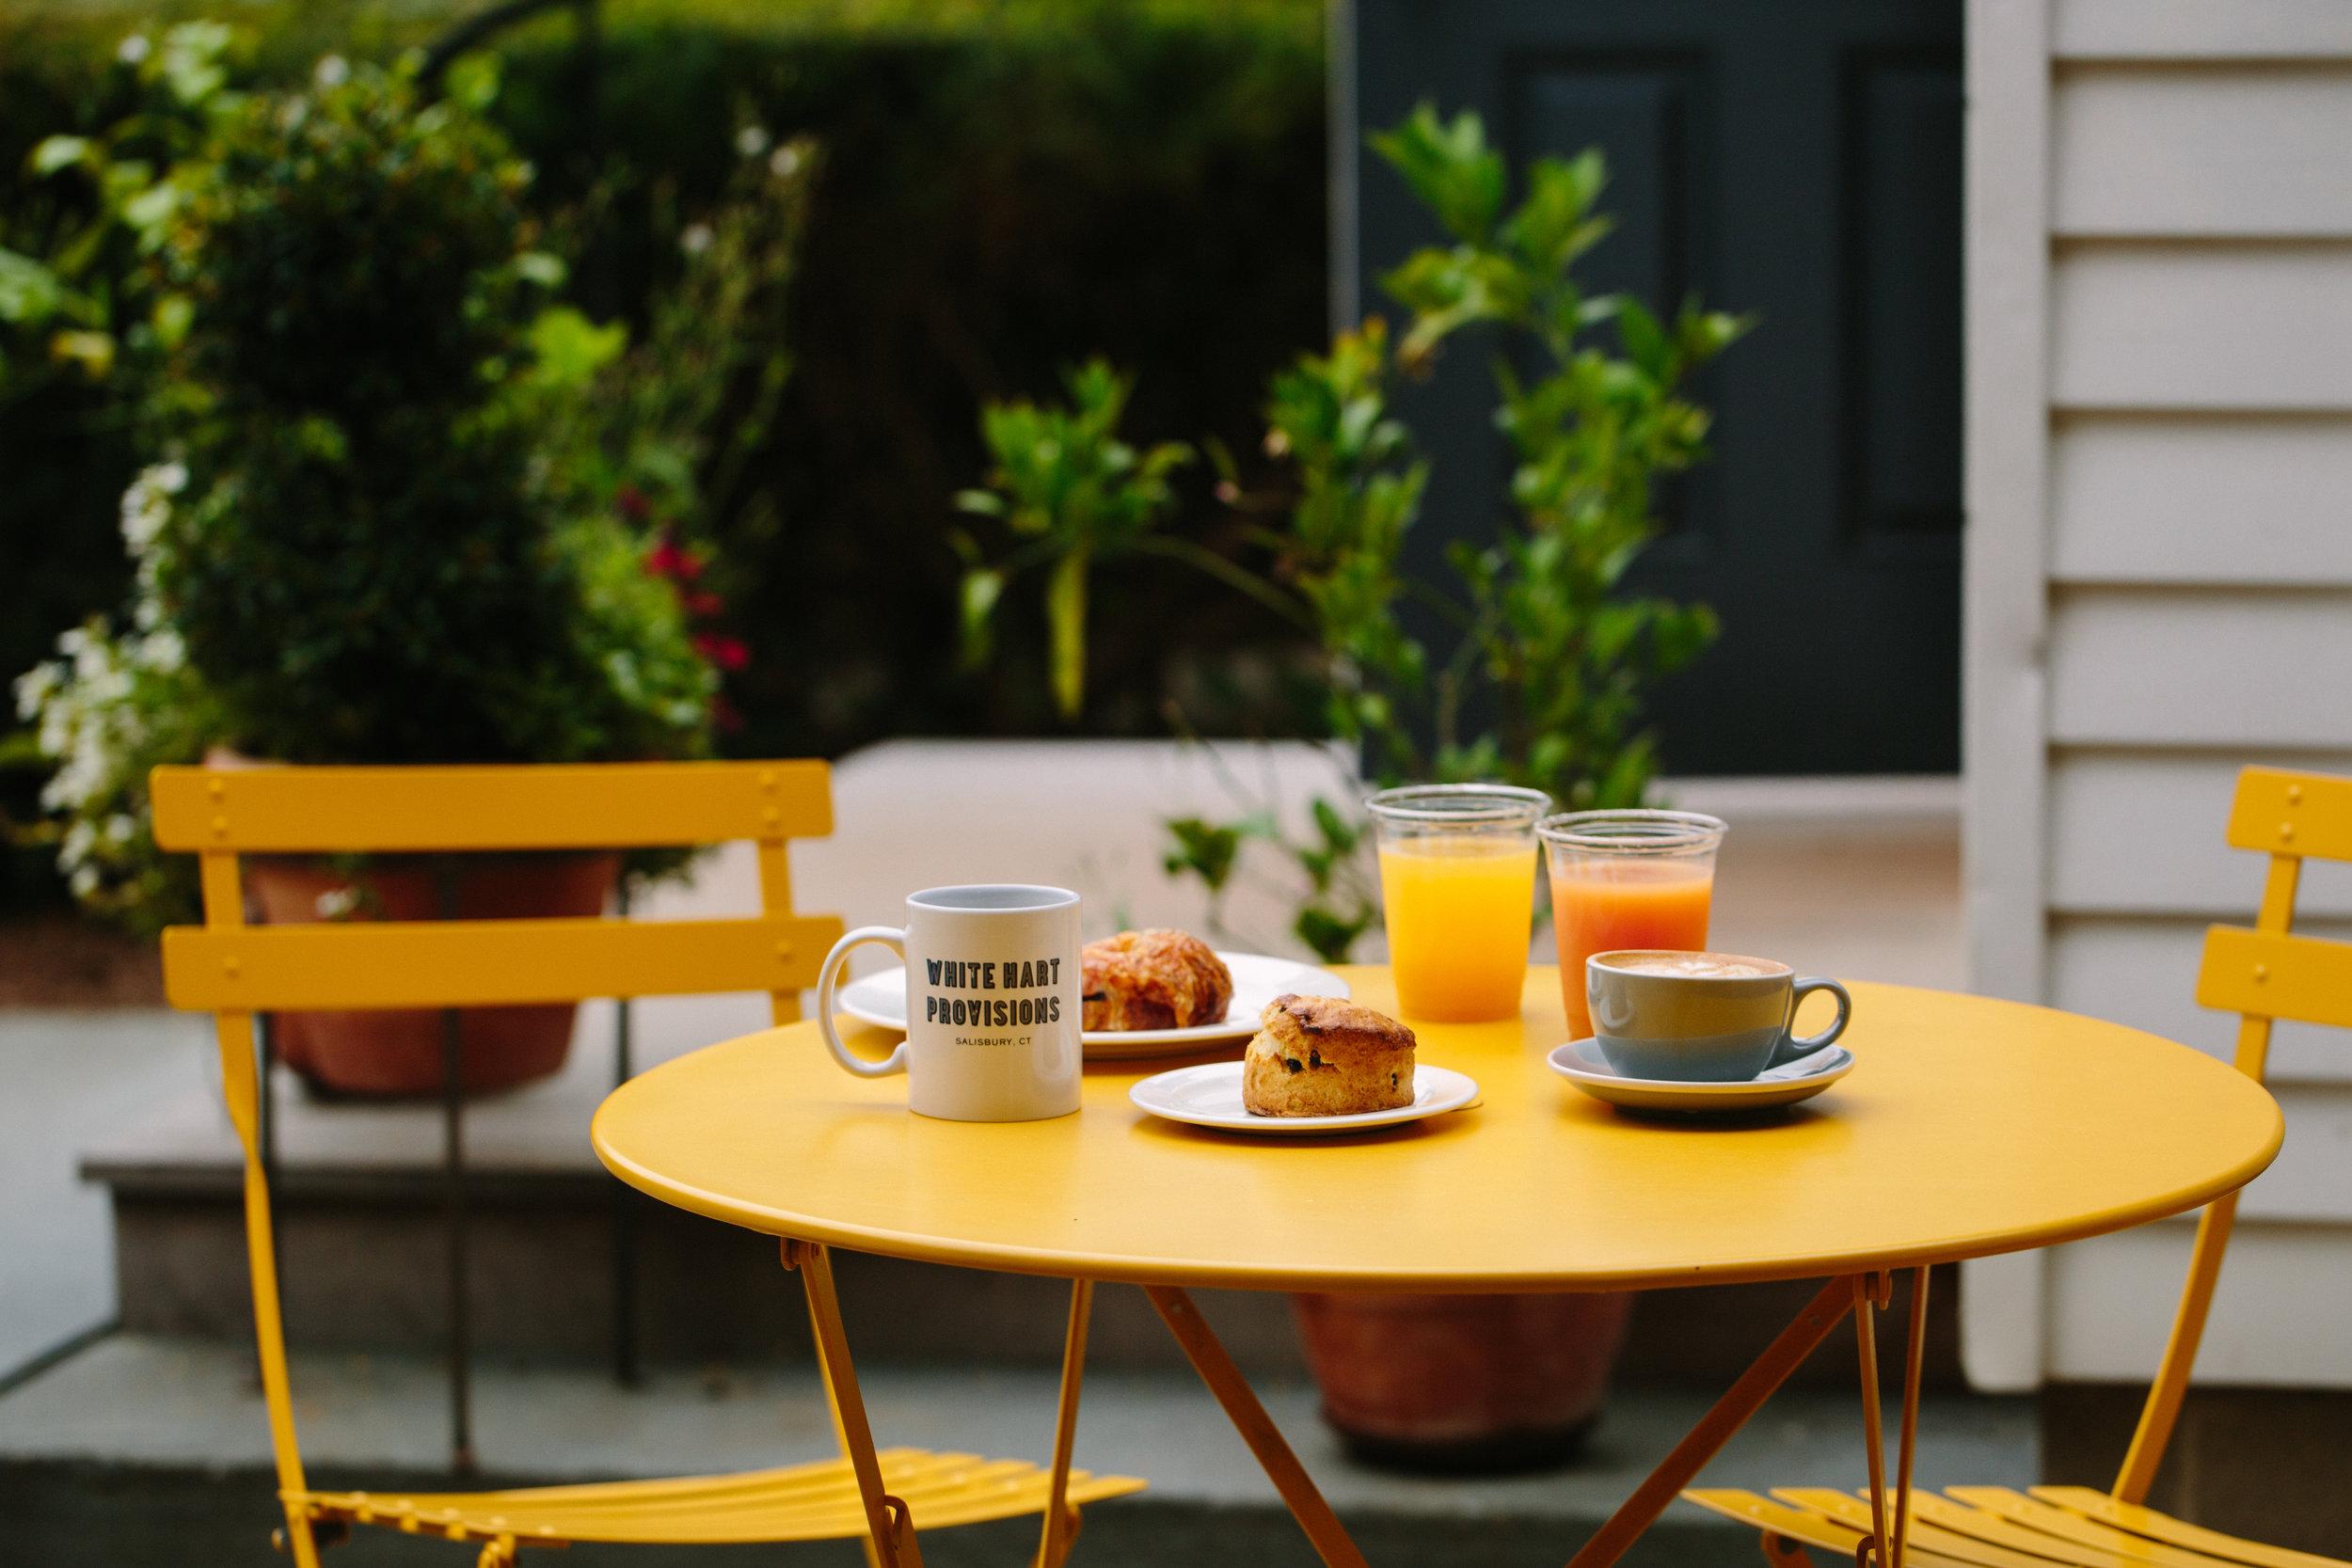 Litchfield County Travel Guide White Hart Provisions Breakfast Spot.jpg